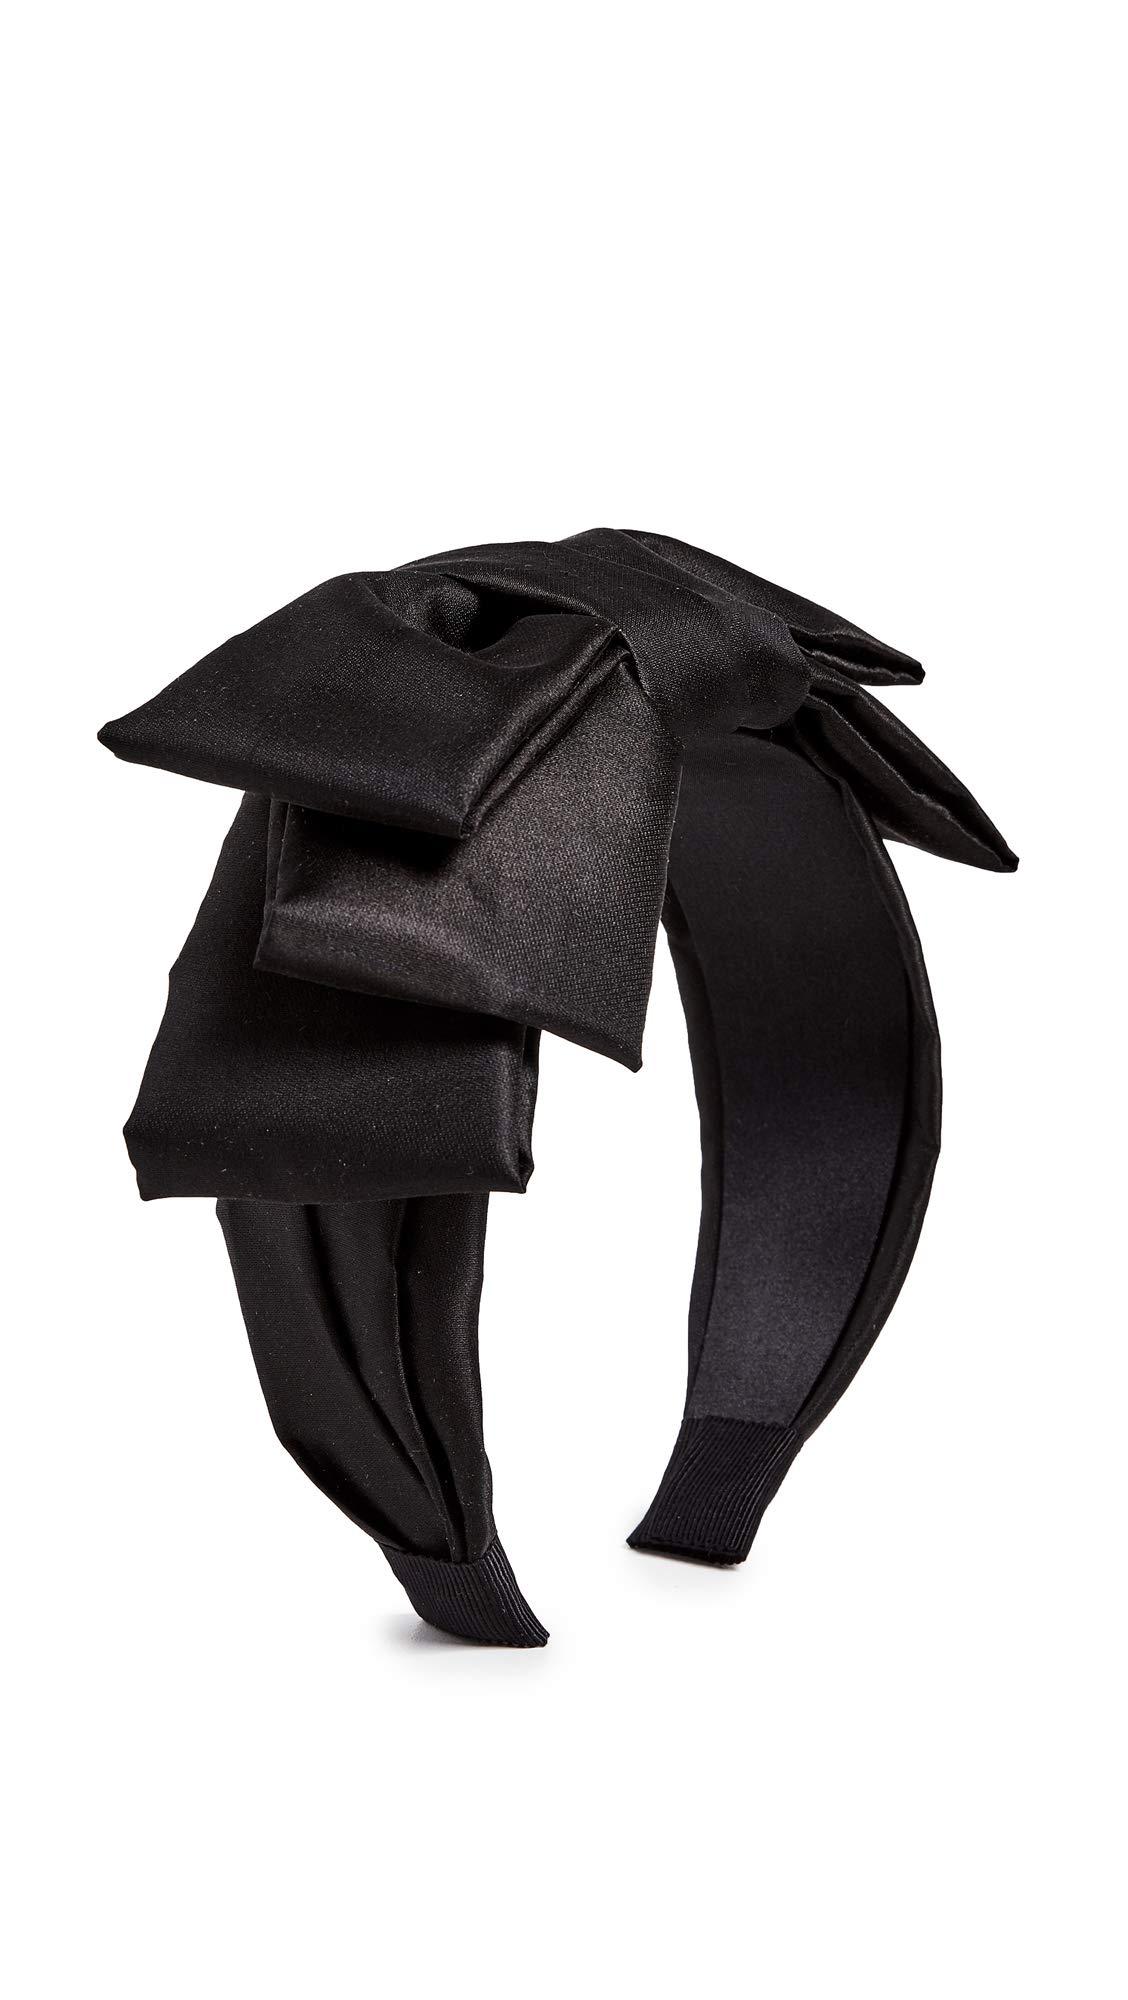 Jennifer Behr Women's Meira Bow Headband, Black, One Size